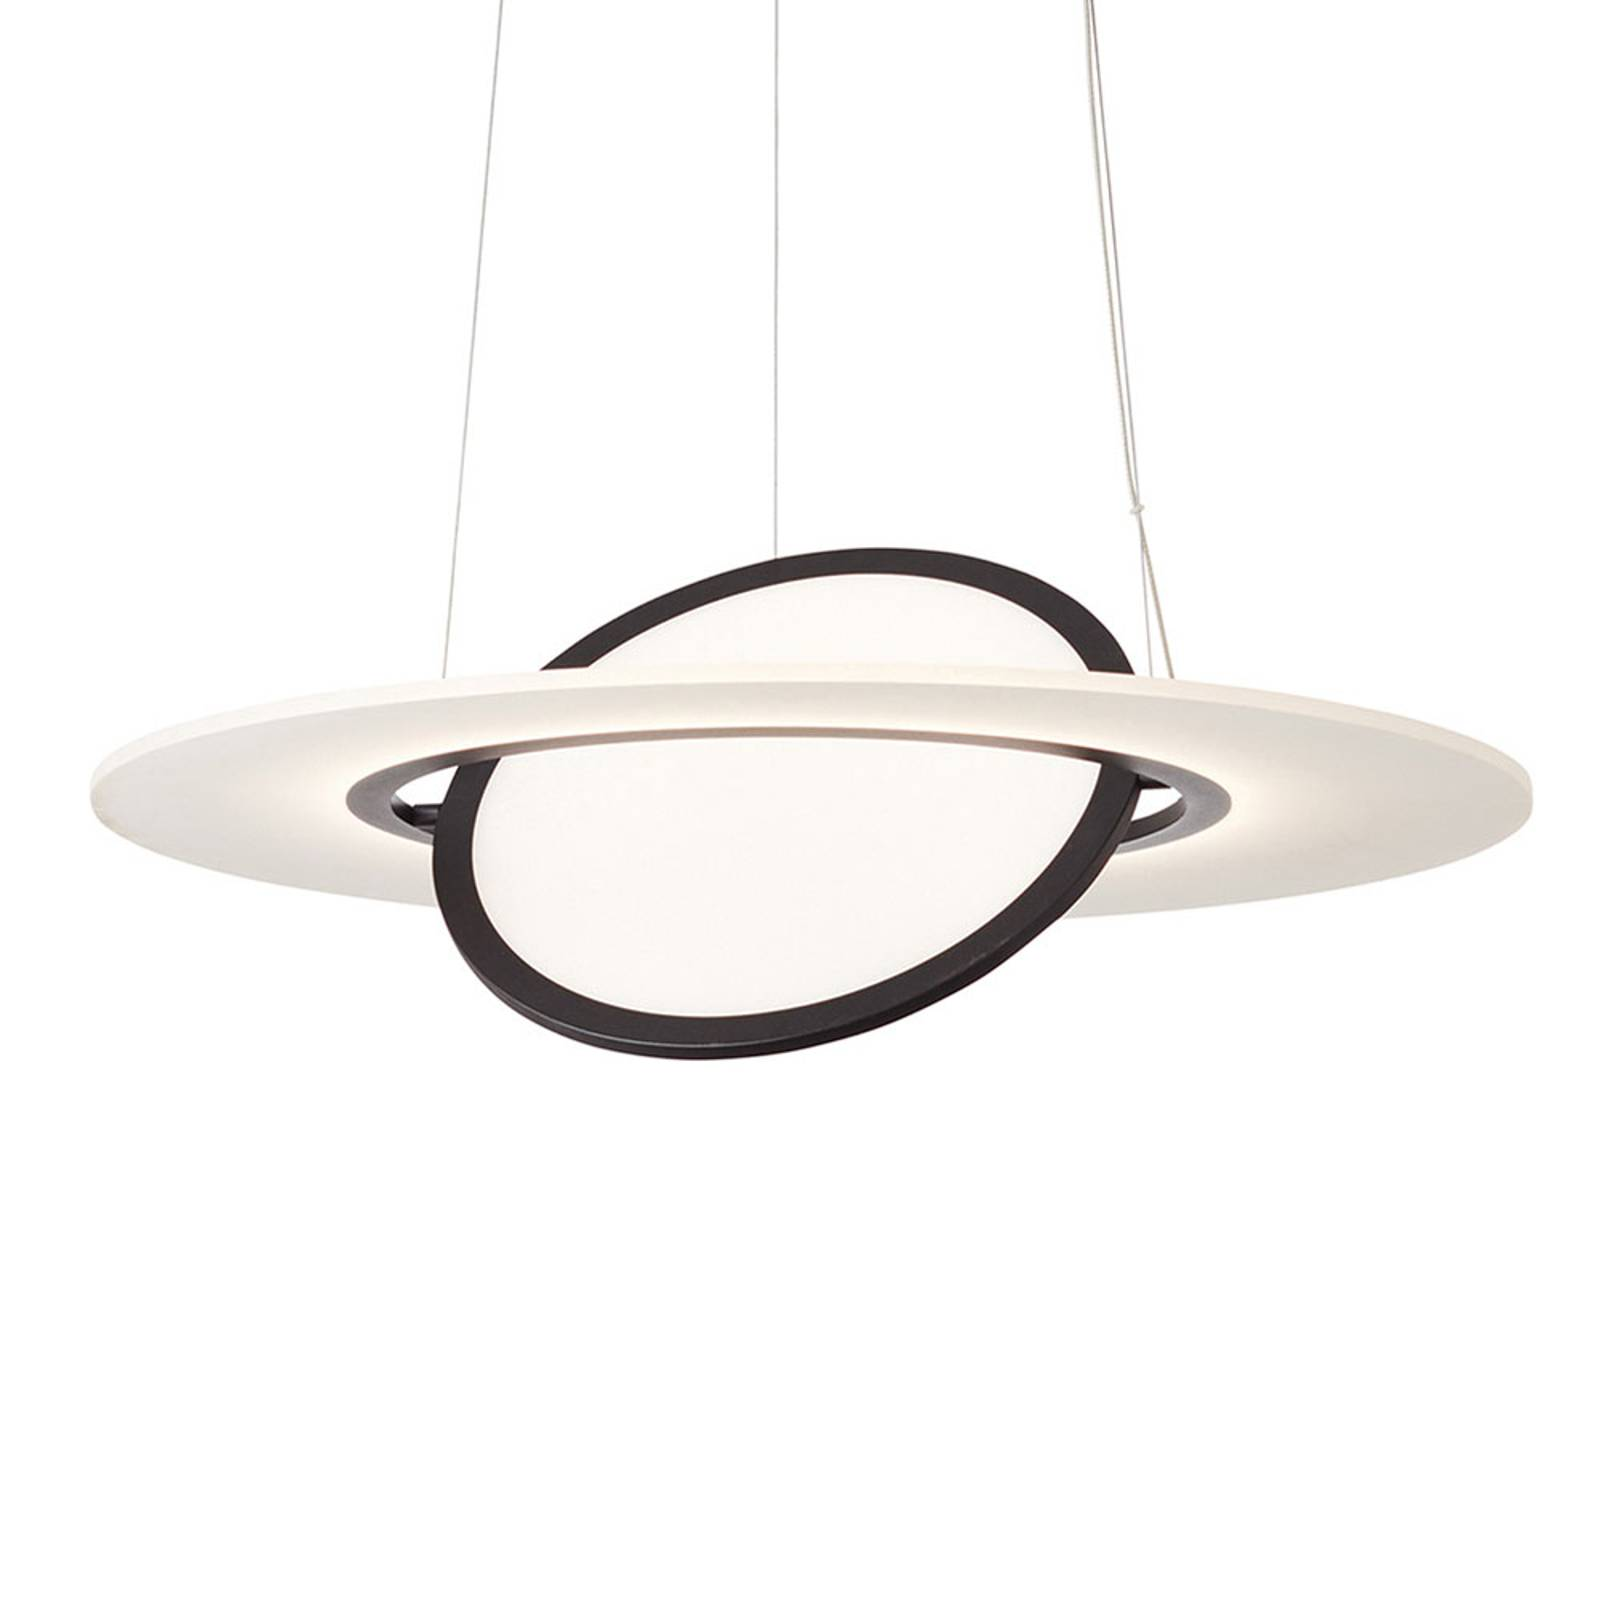 AEG Olia LED-Hängeleuchte, rund, CCT, dimmbar